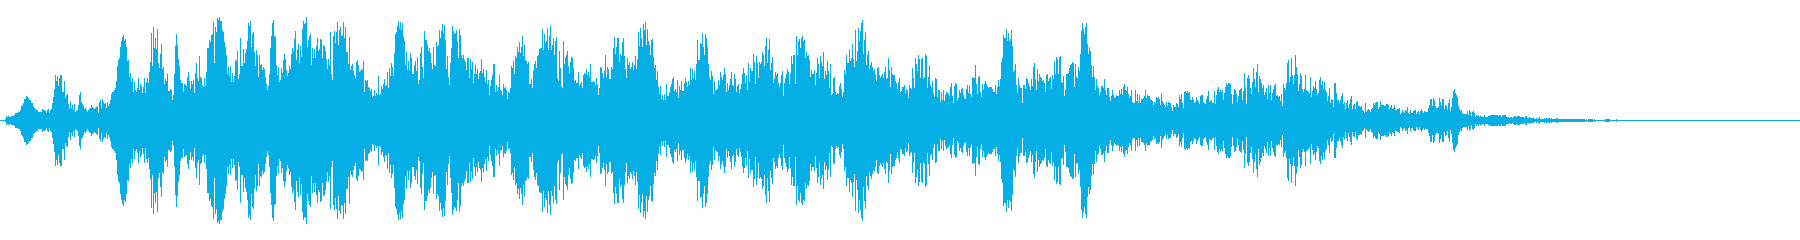 UFOが着陸した直後の音の再生済みの波形